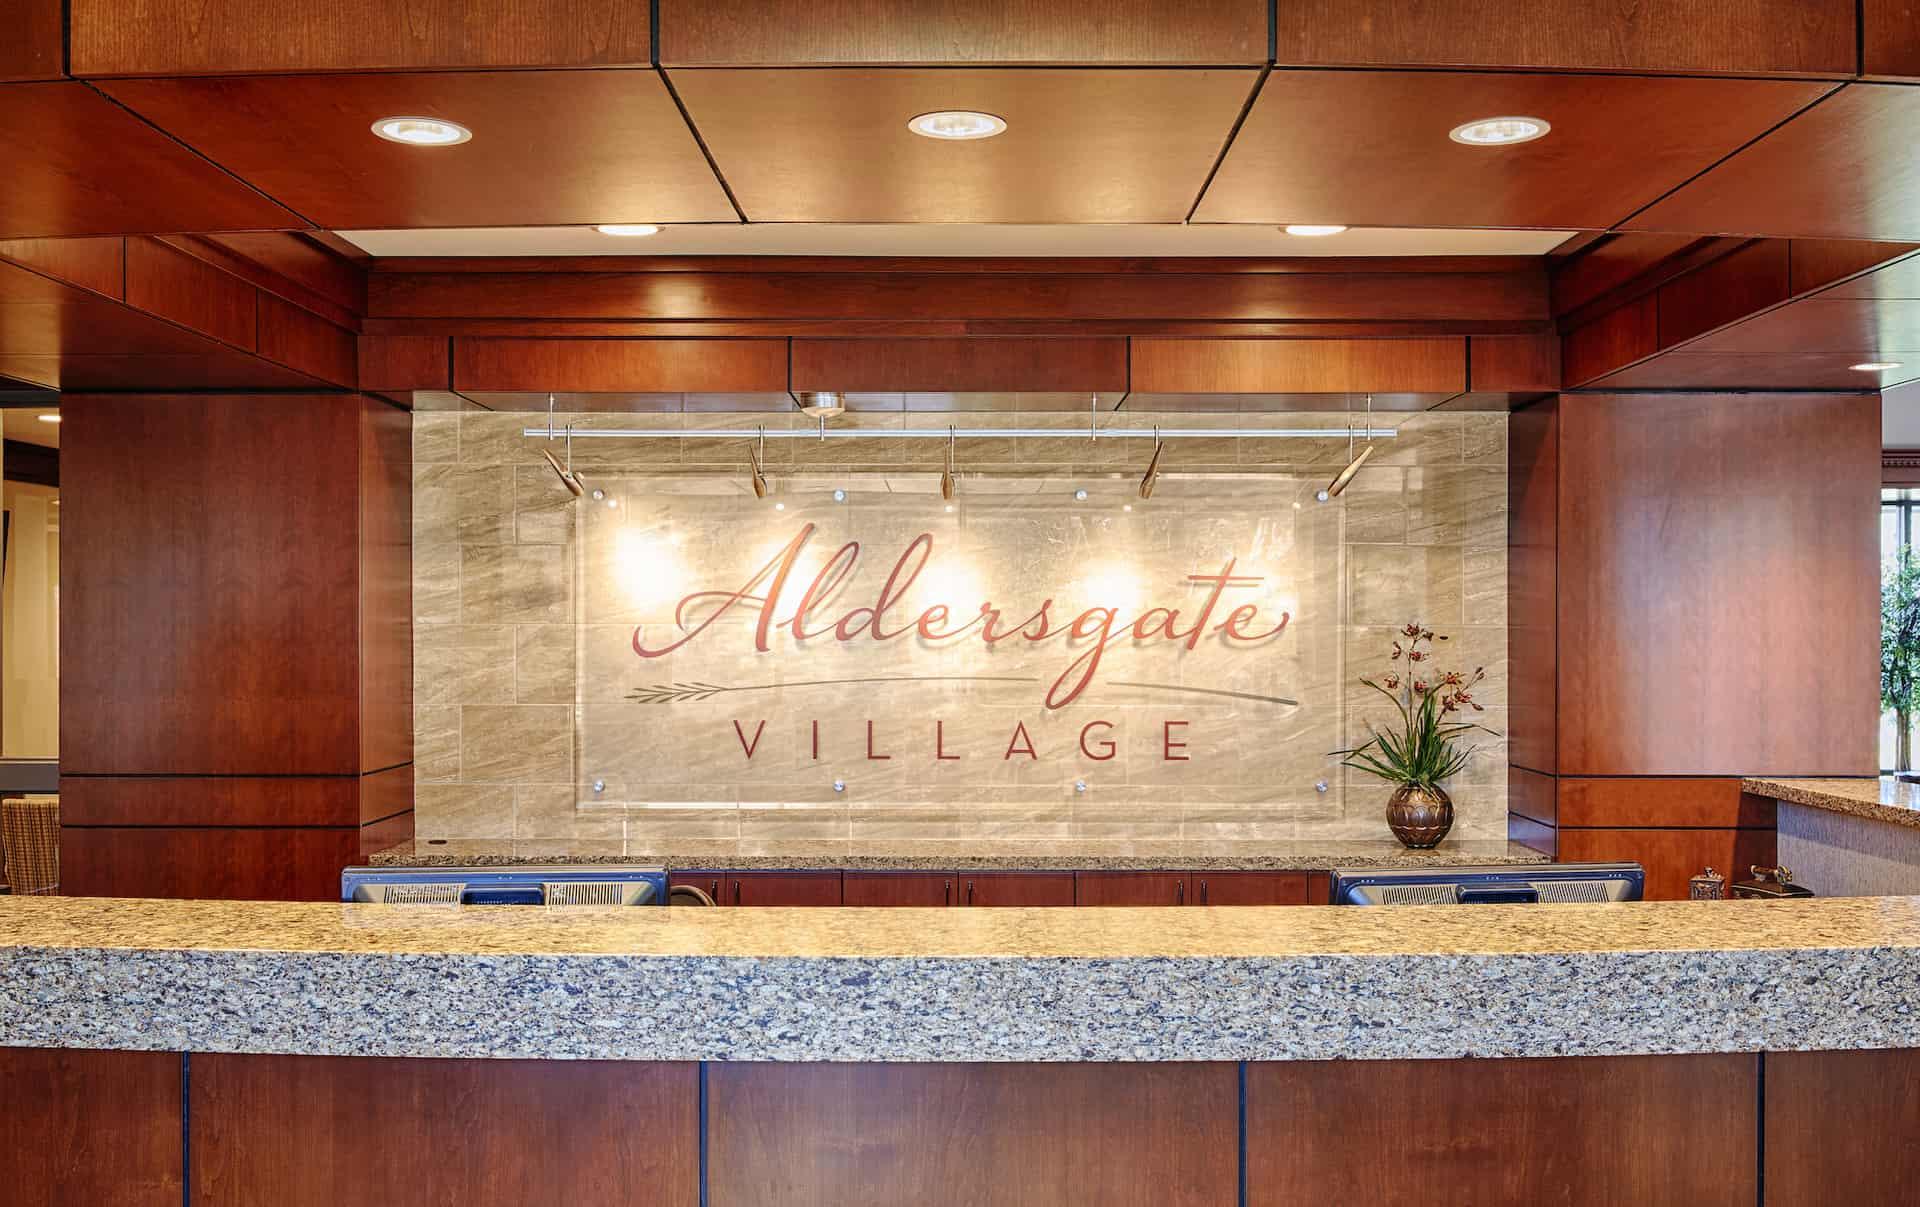 Aldersgate Reception (1)